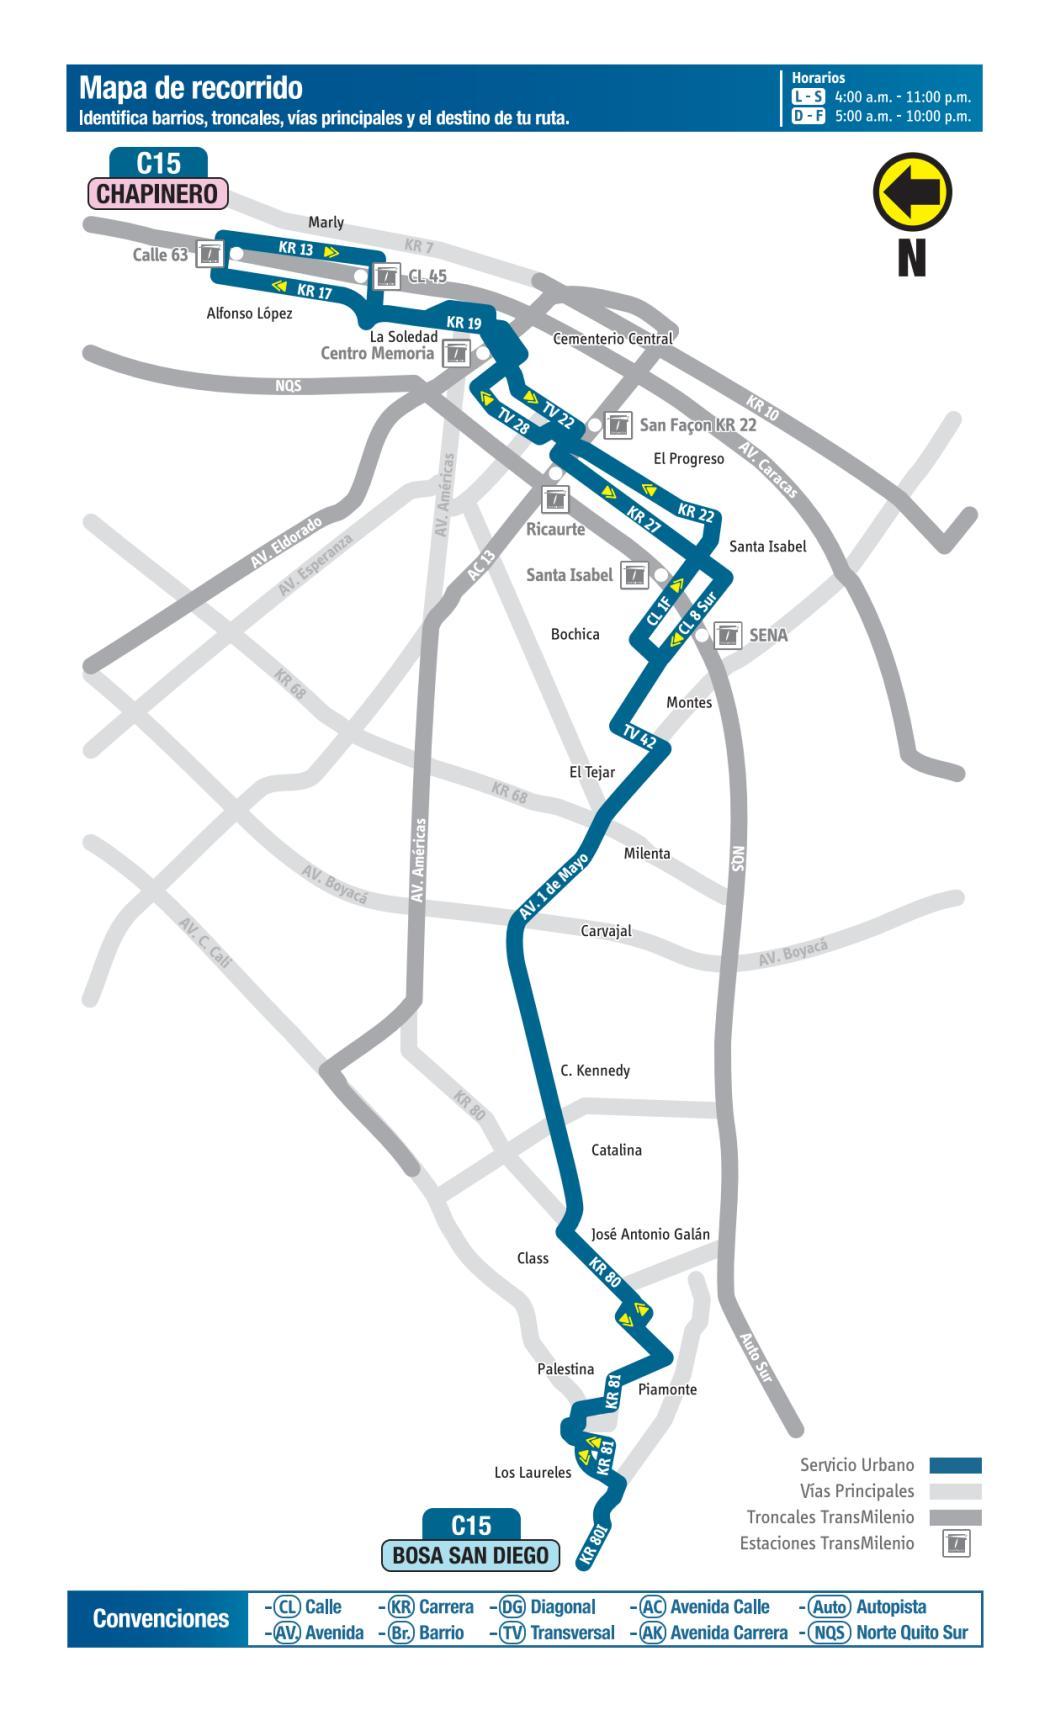 C15 Bosa San Diego - Chapinero, mapa bus urbano Bogotá